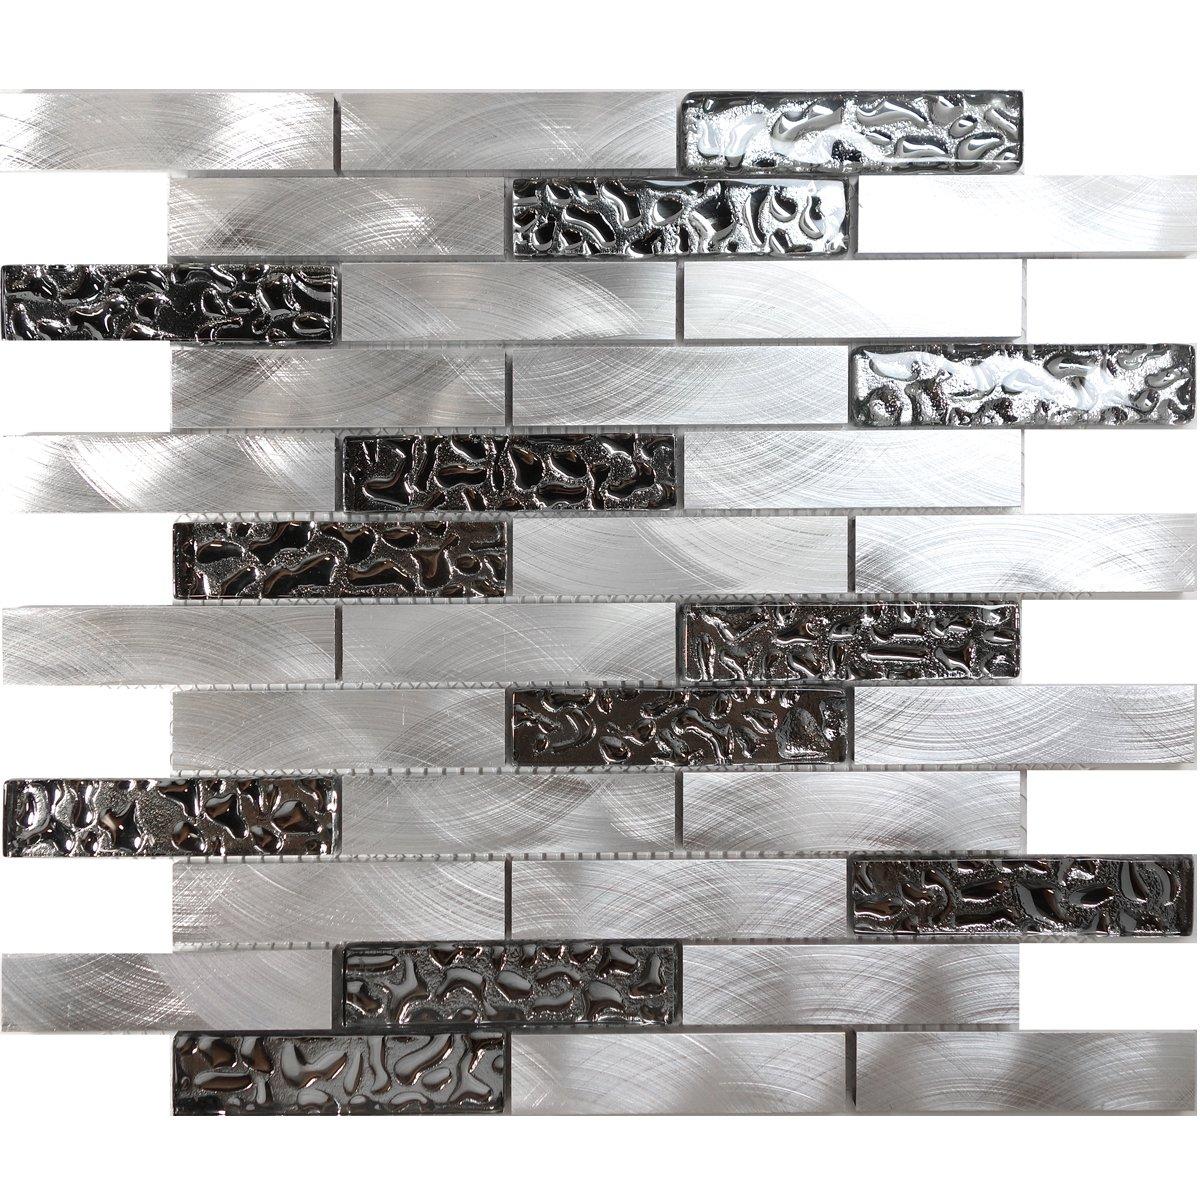 Modket TDH205MO Metallic Silver Stainless Steel Aluminum Metal Glass Mosaic Tile Brick Joint Pattern Backsplash